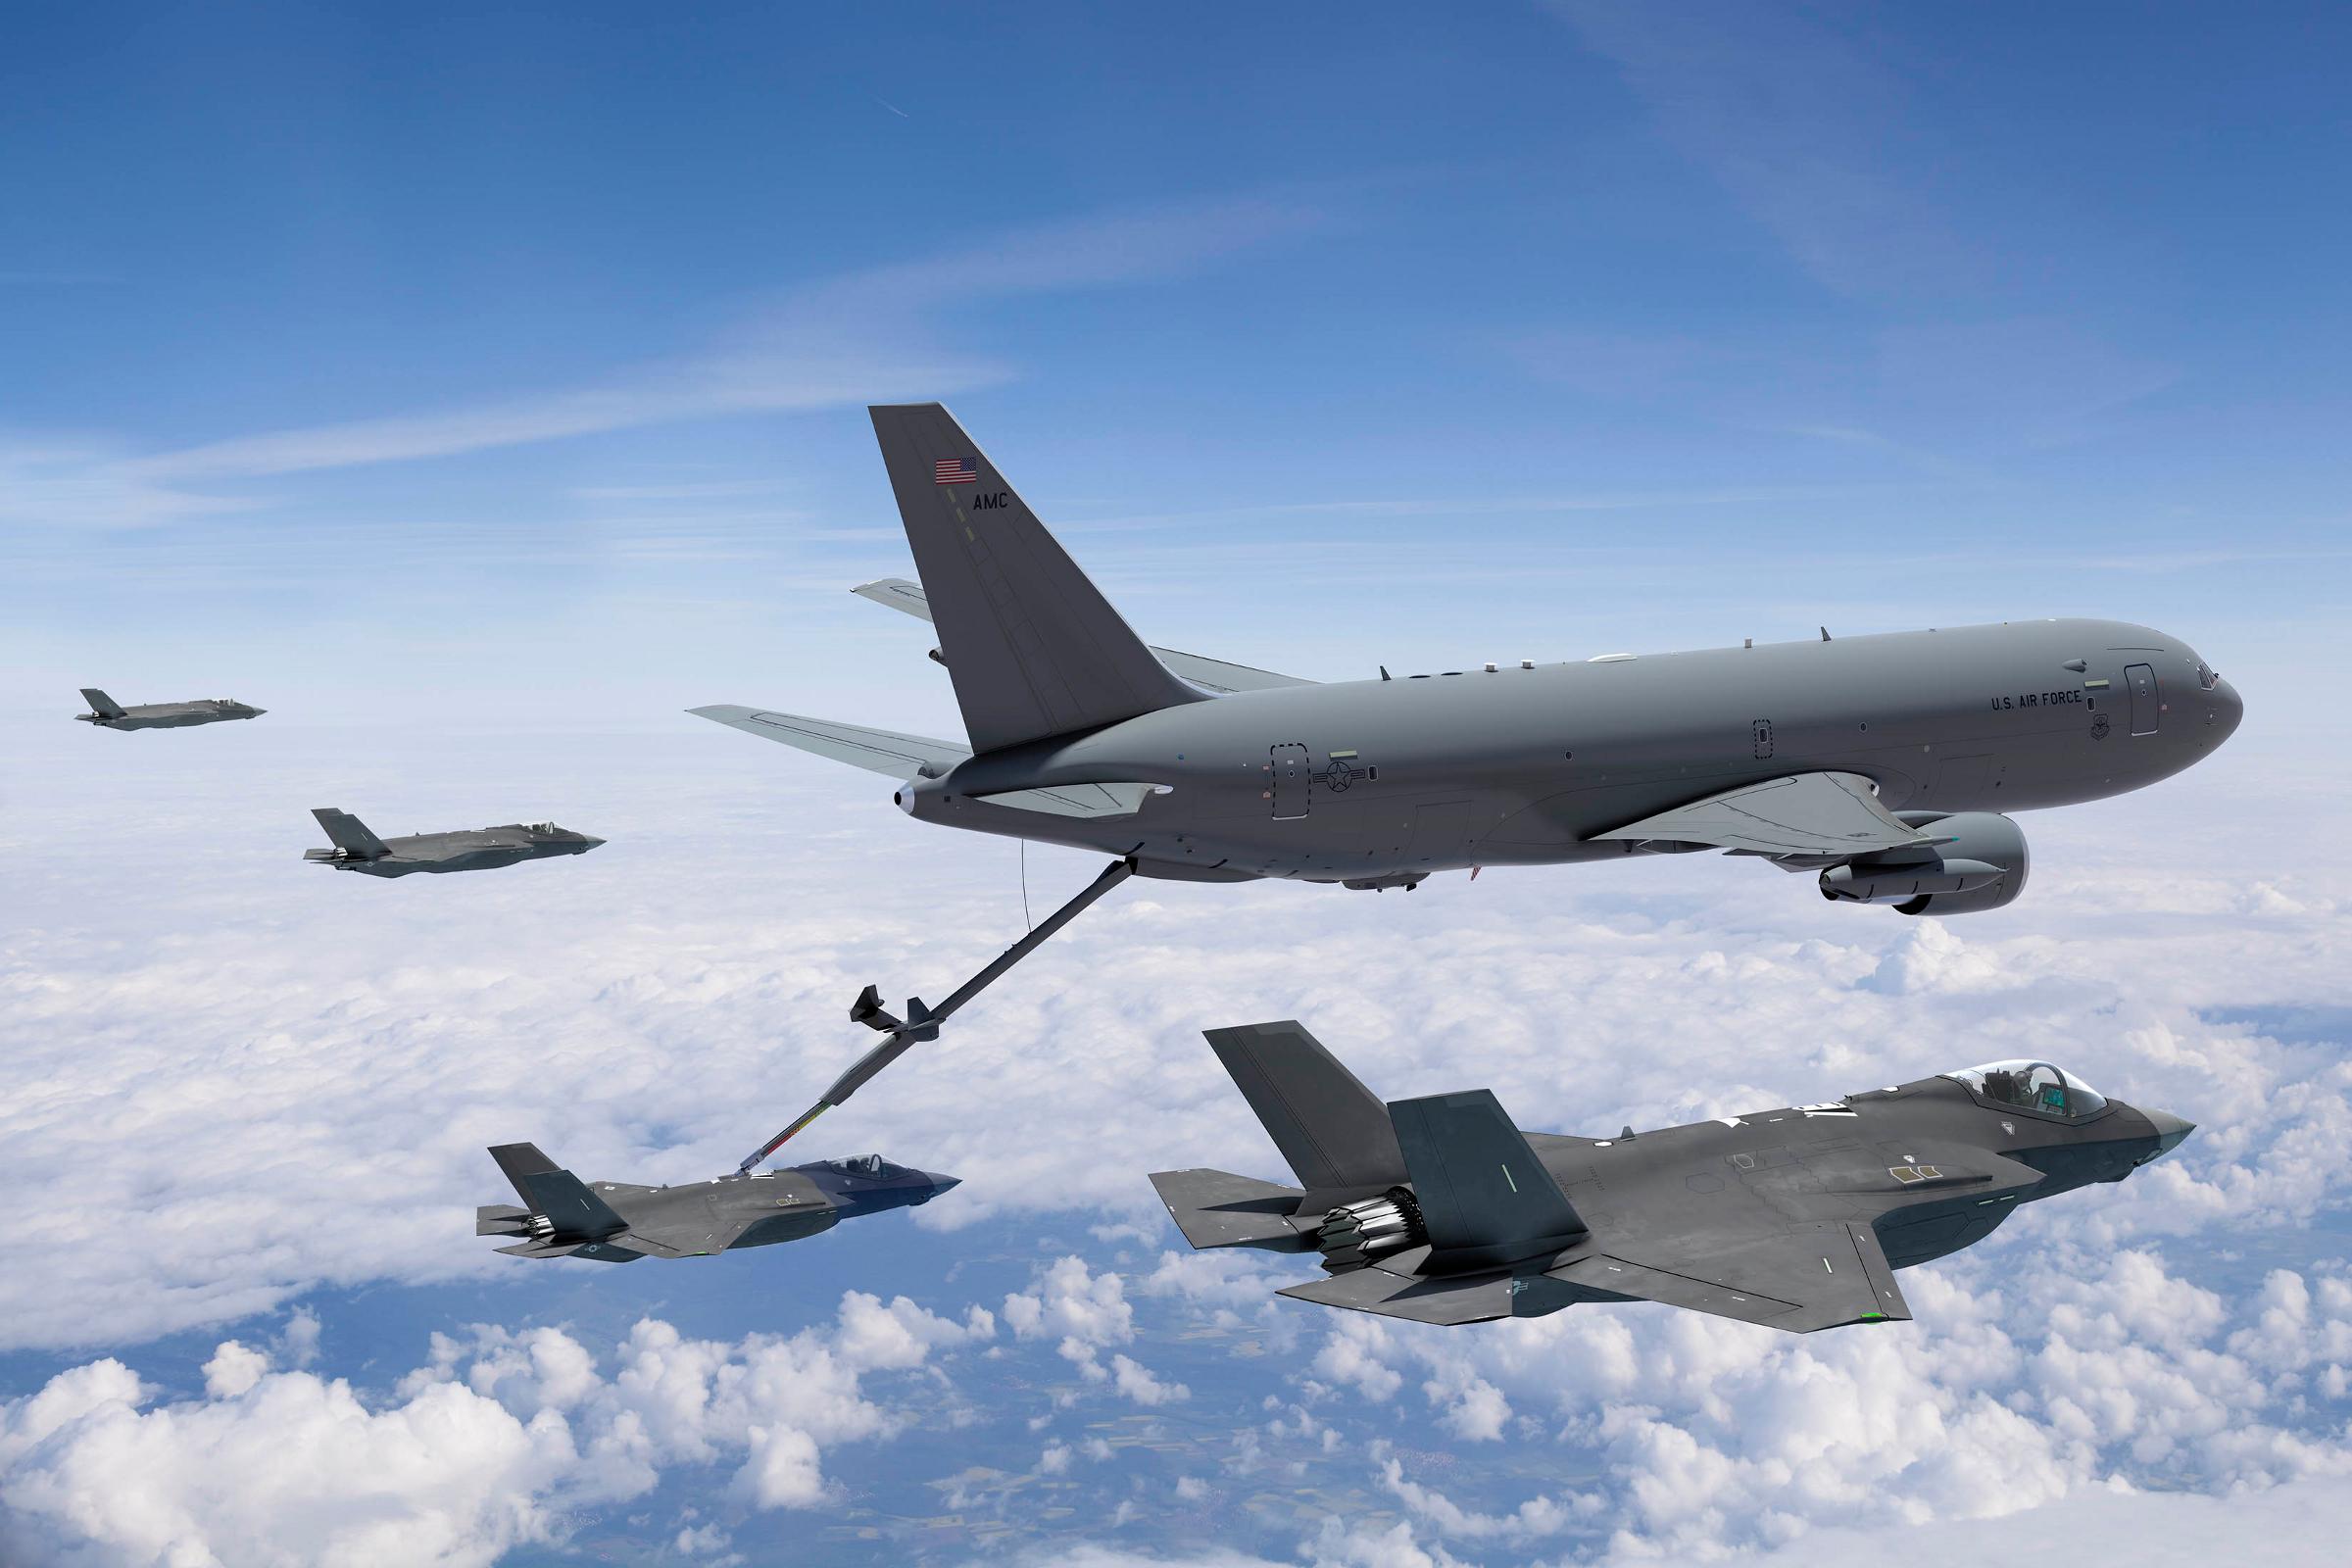 Rendering of a KC-46 refueling a fighter mid-flight.